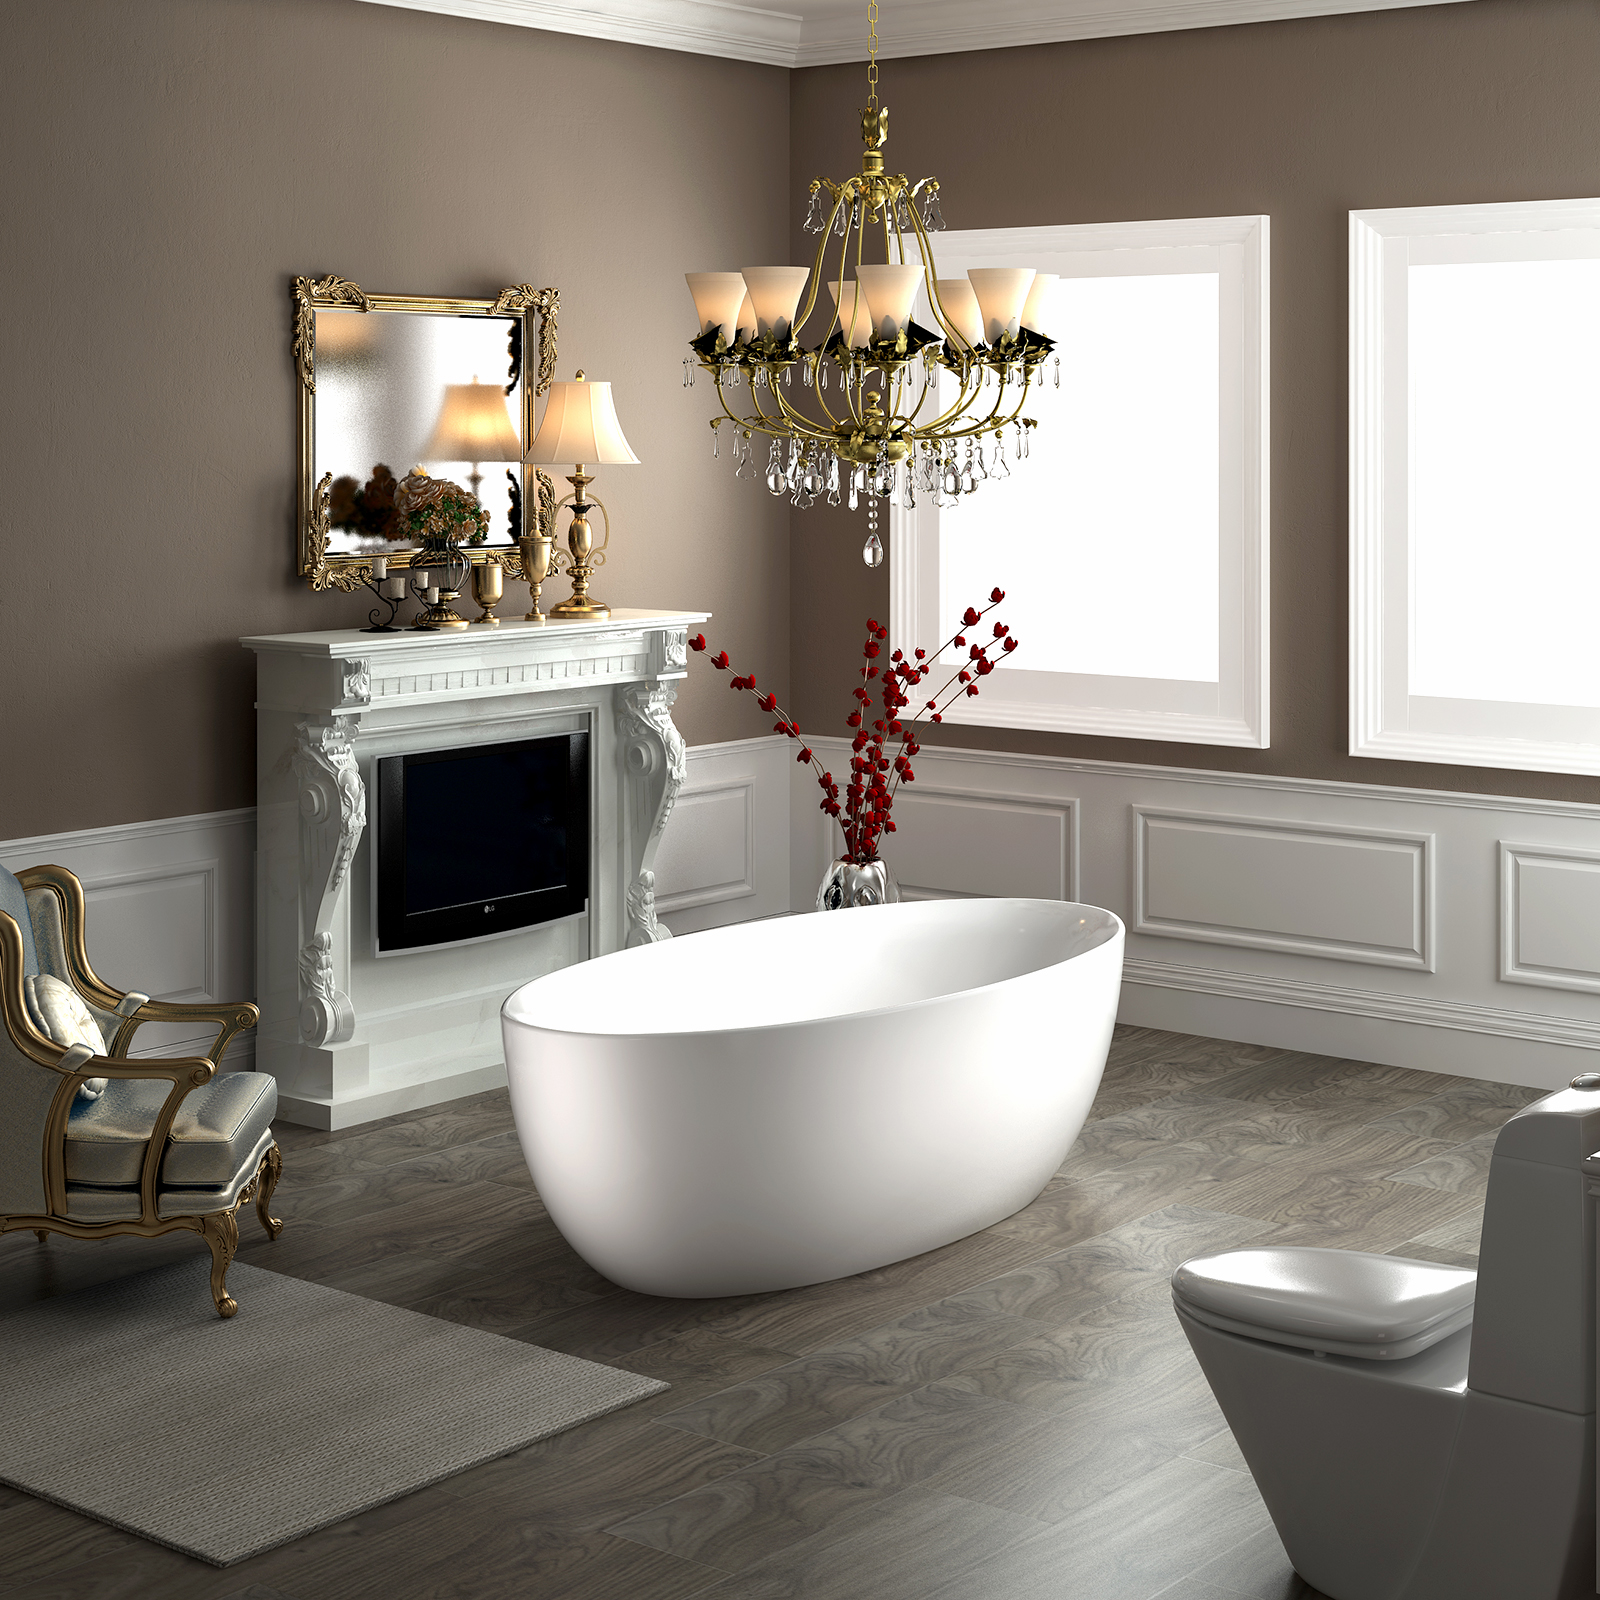 Freistehende badewanne terra acryl wei matt 186 x 88 x 60 cm standarmatur w hlbar badewelt - Standarmatur freistehende badewanne ...